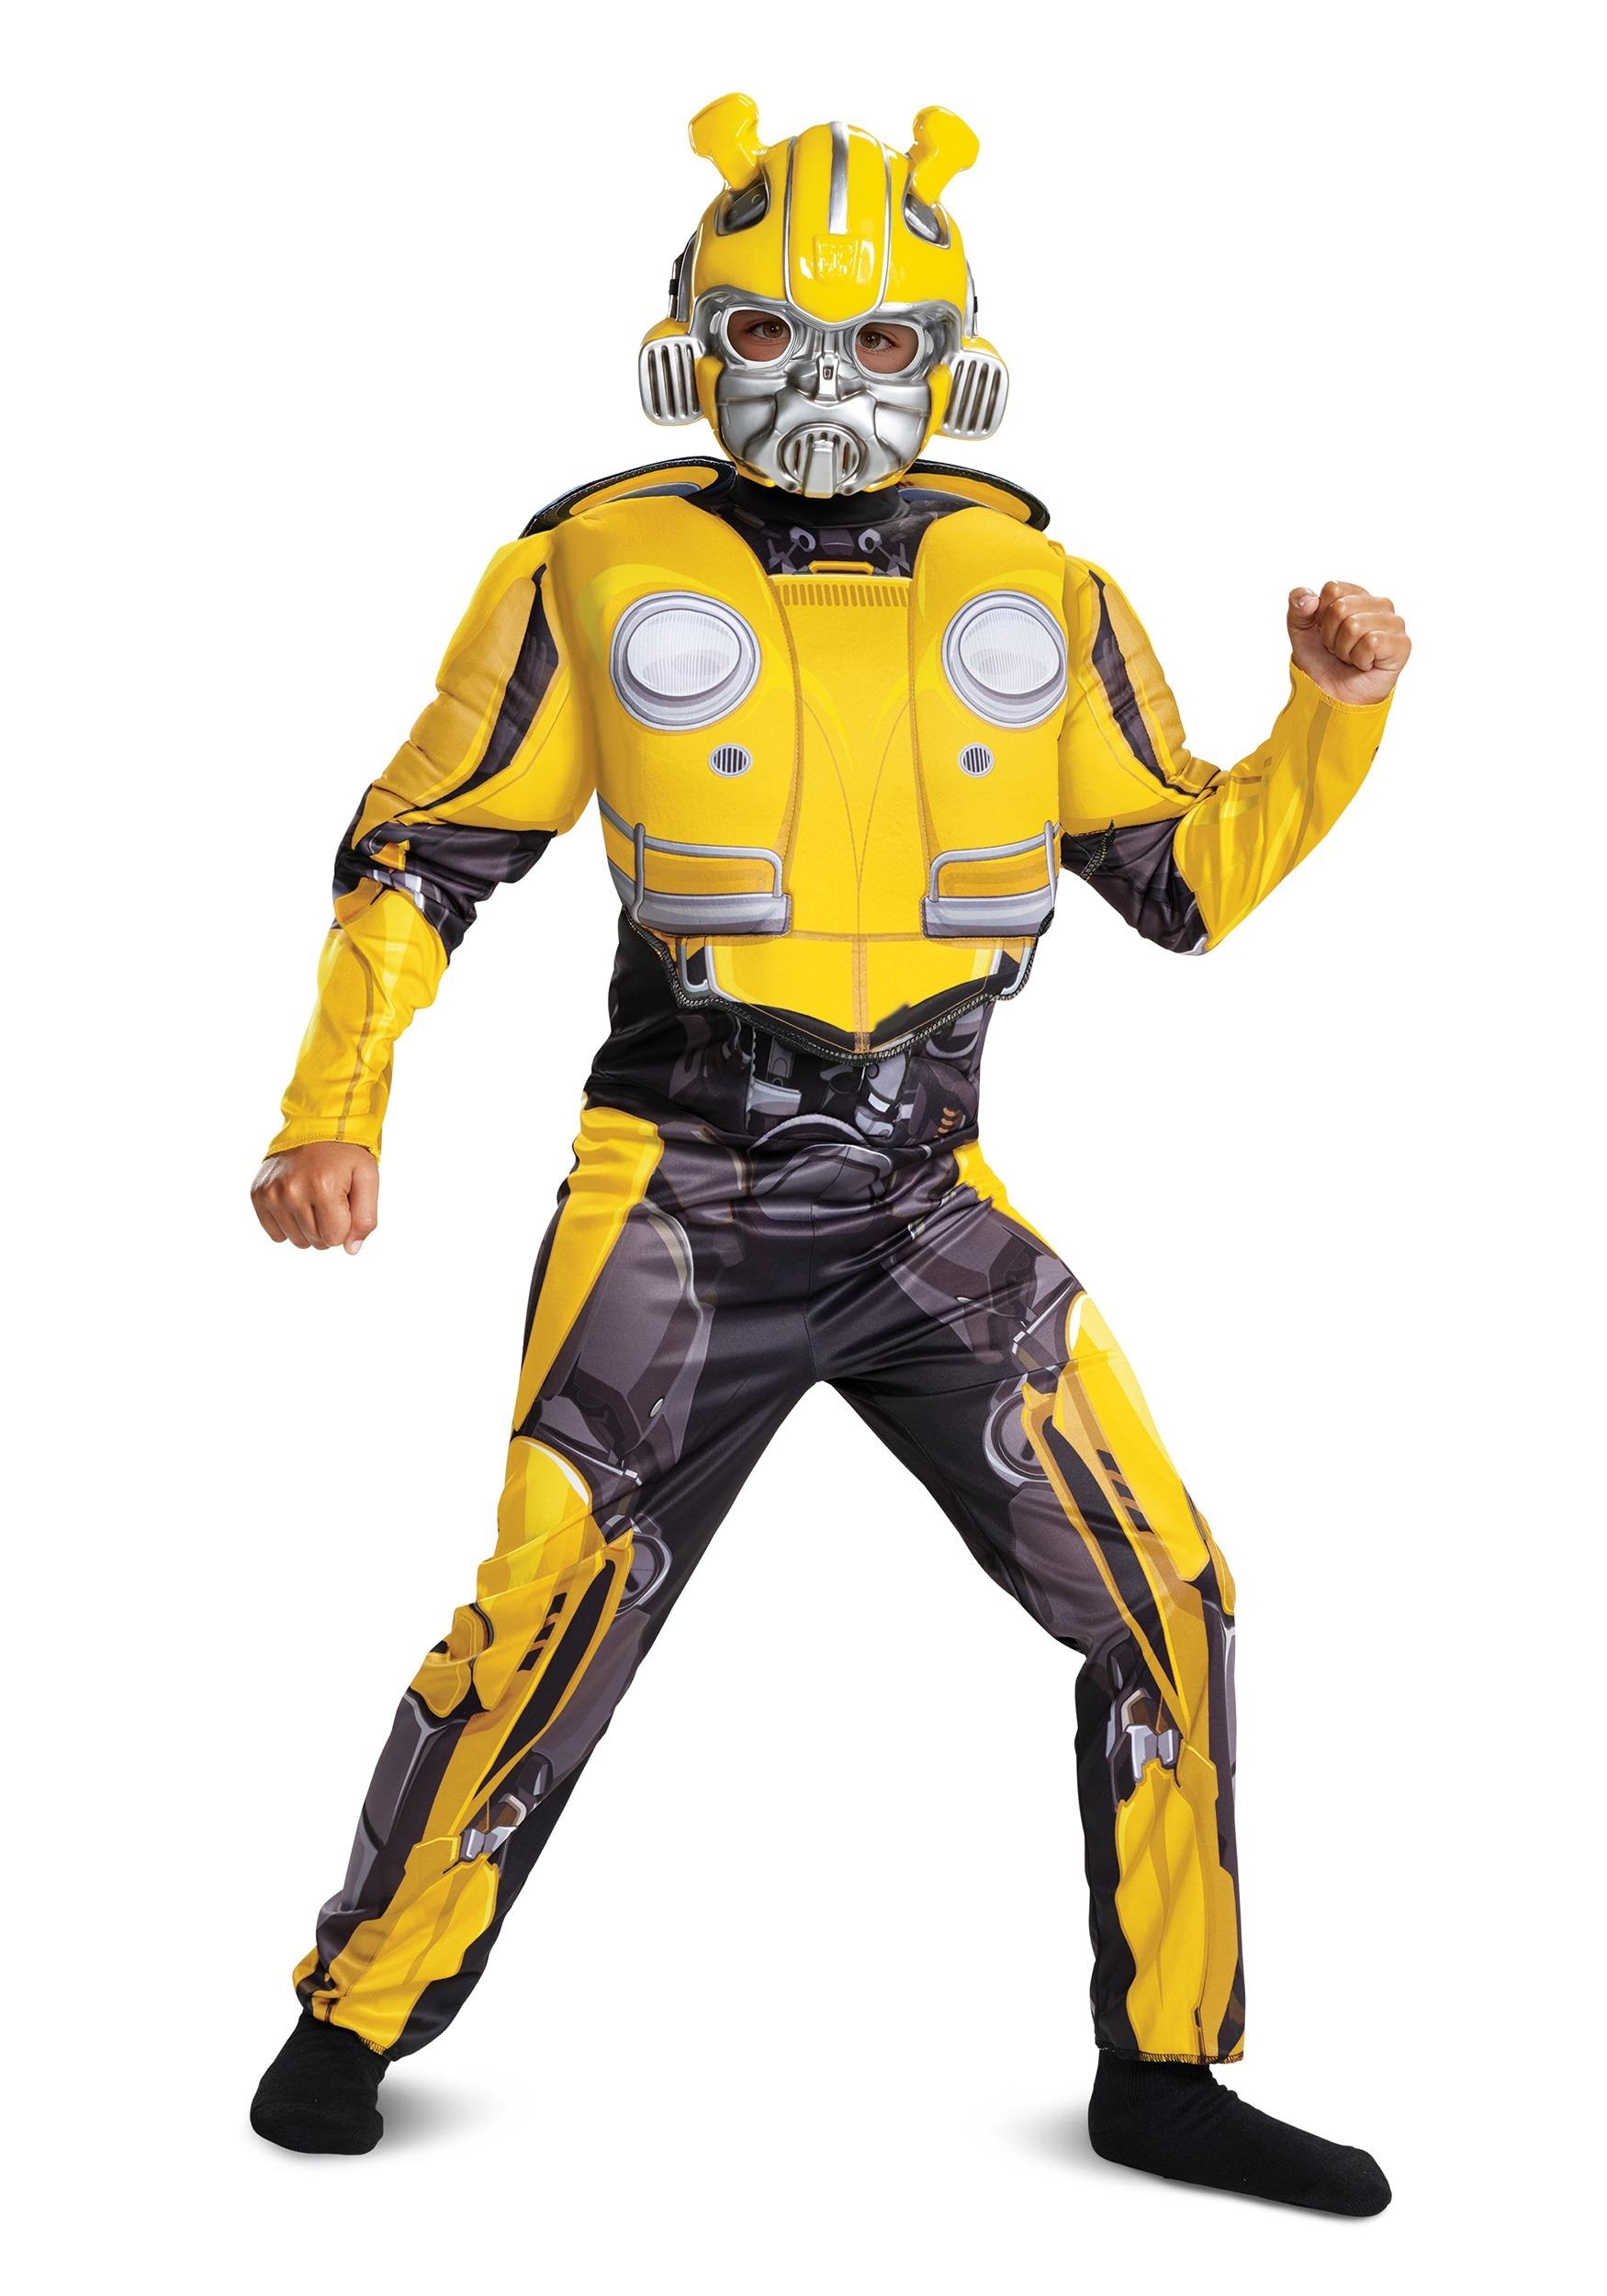 Kids Bumblebee Movie Bumblebee Muscle Costume